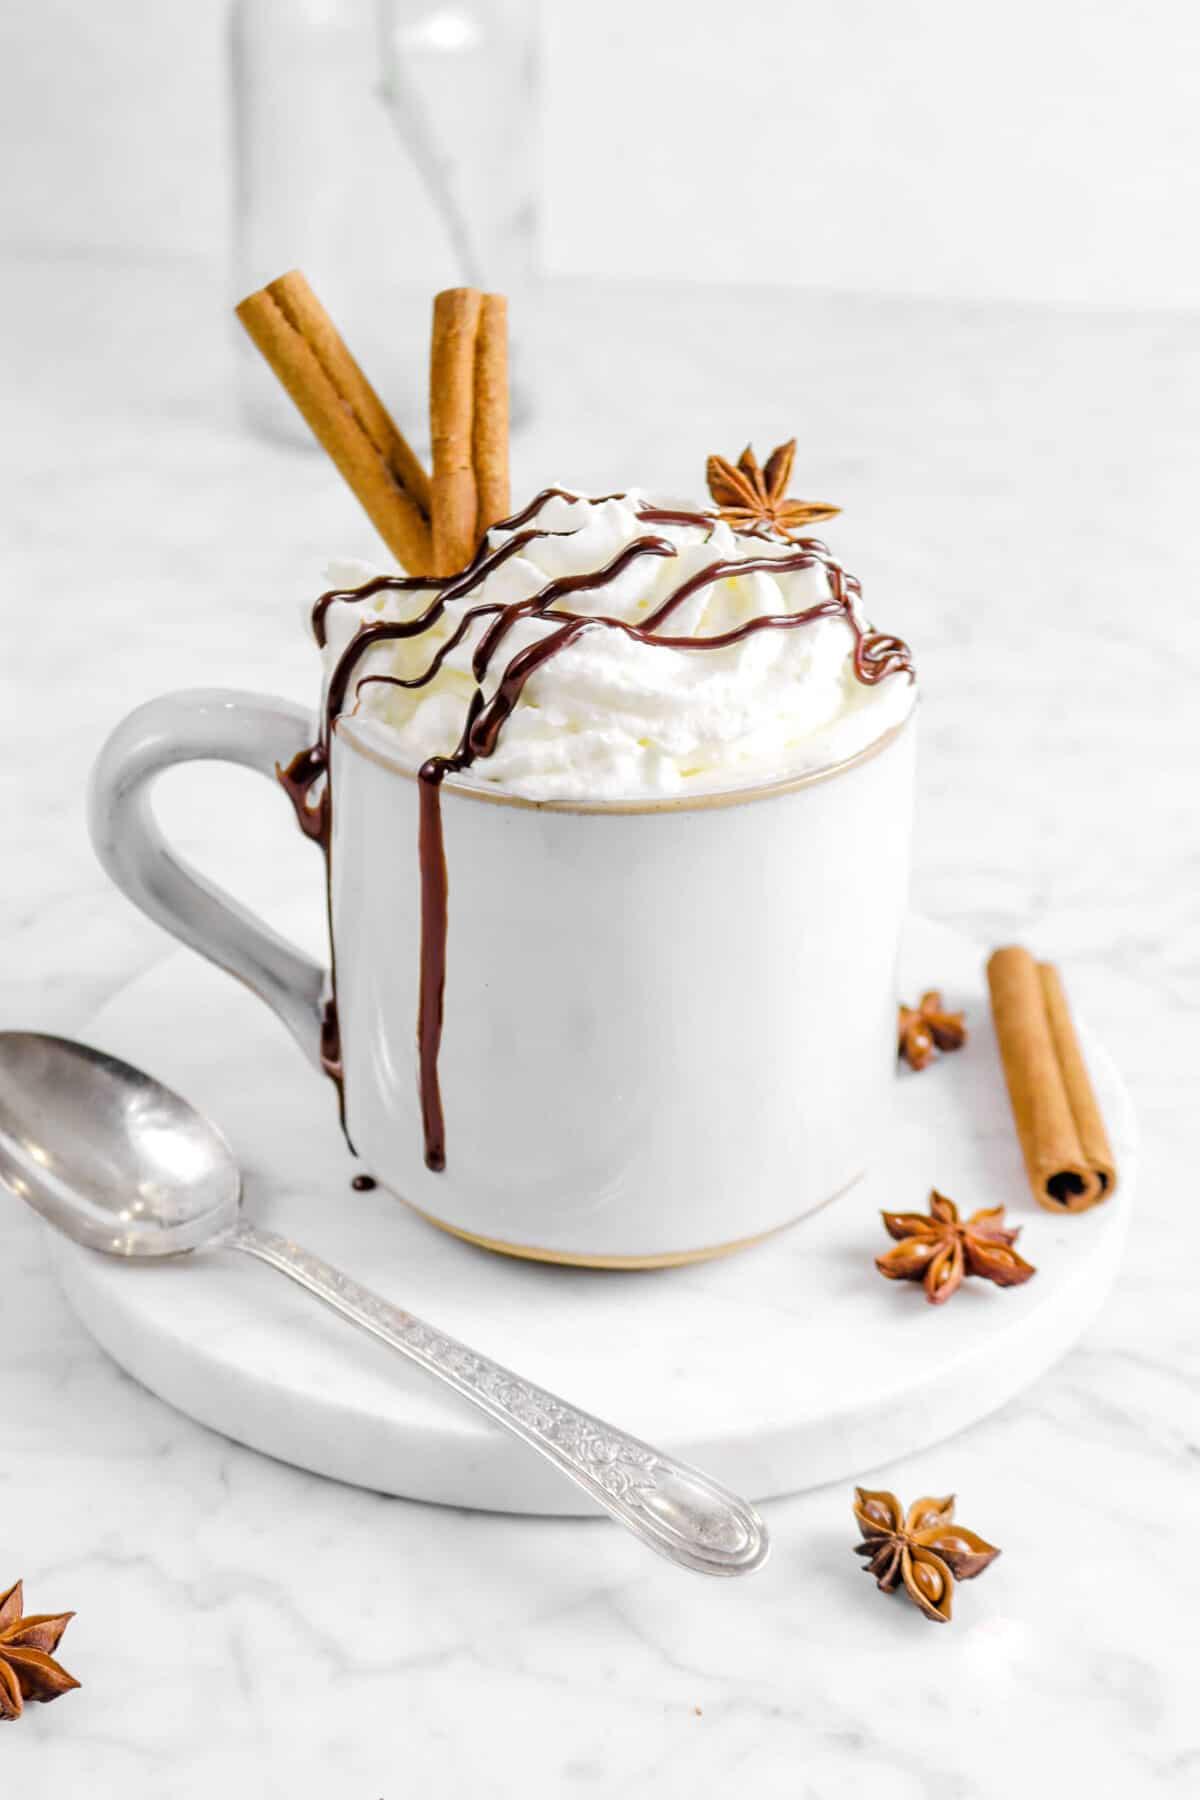 mug with whipped cream, chocolate sauce, cinnamon sticks, and star anise